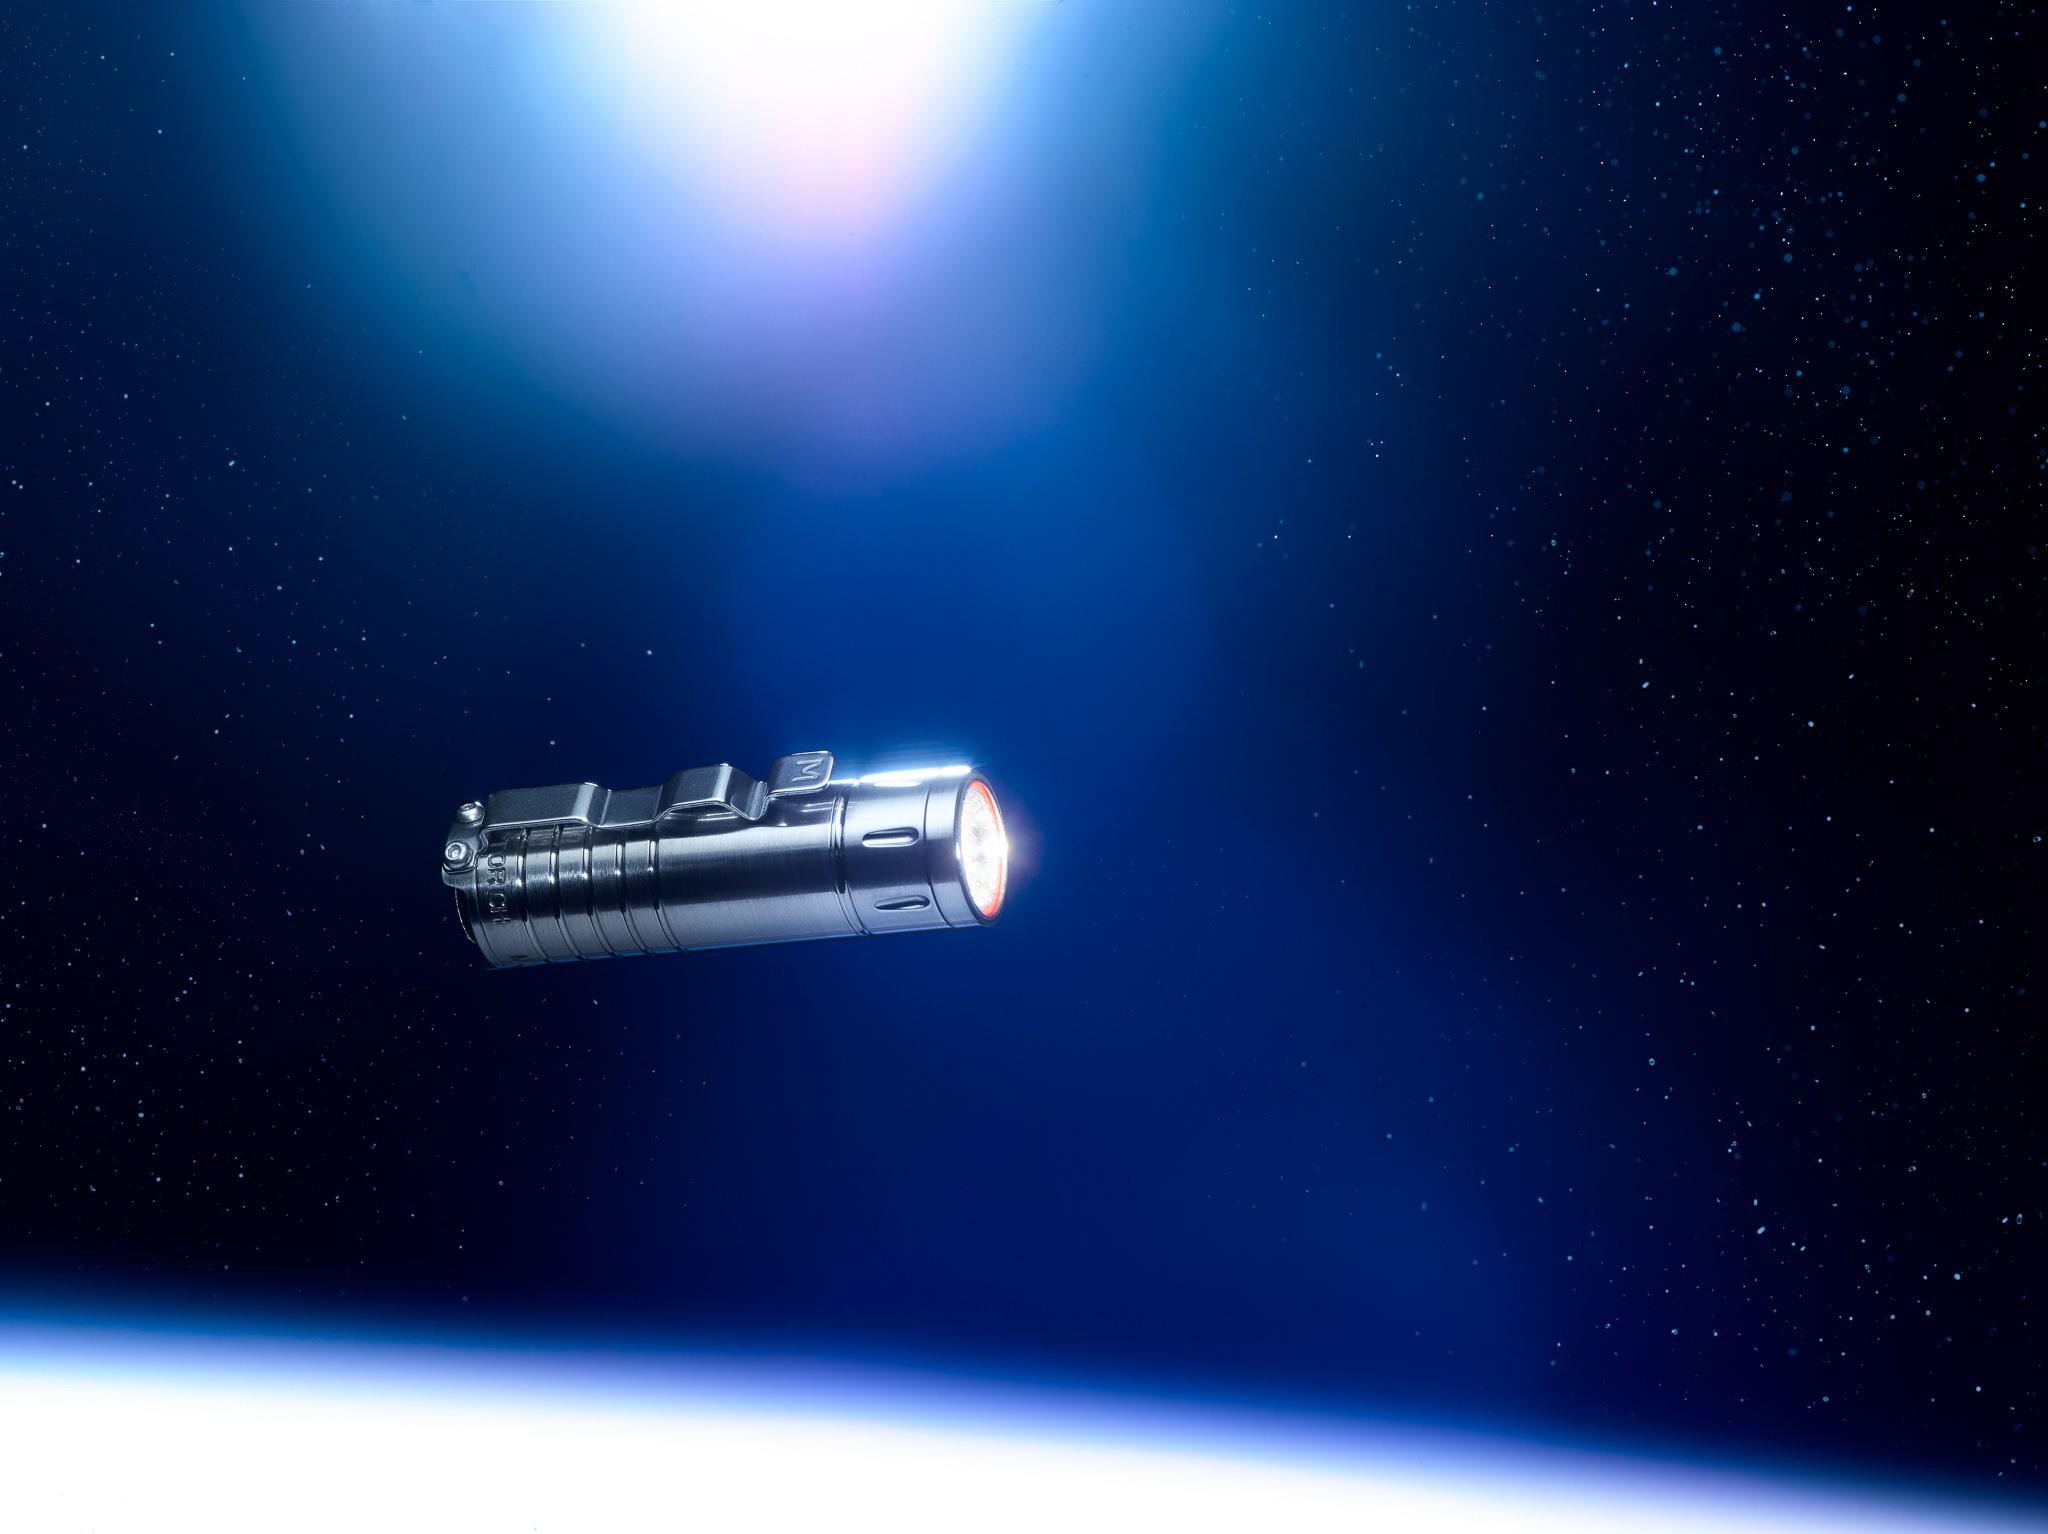 aeon-in-space-2.jpg